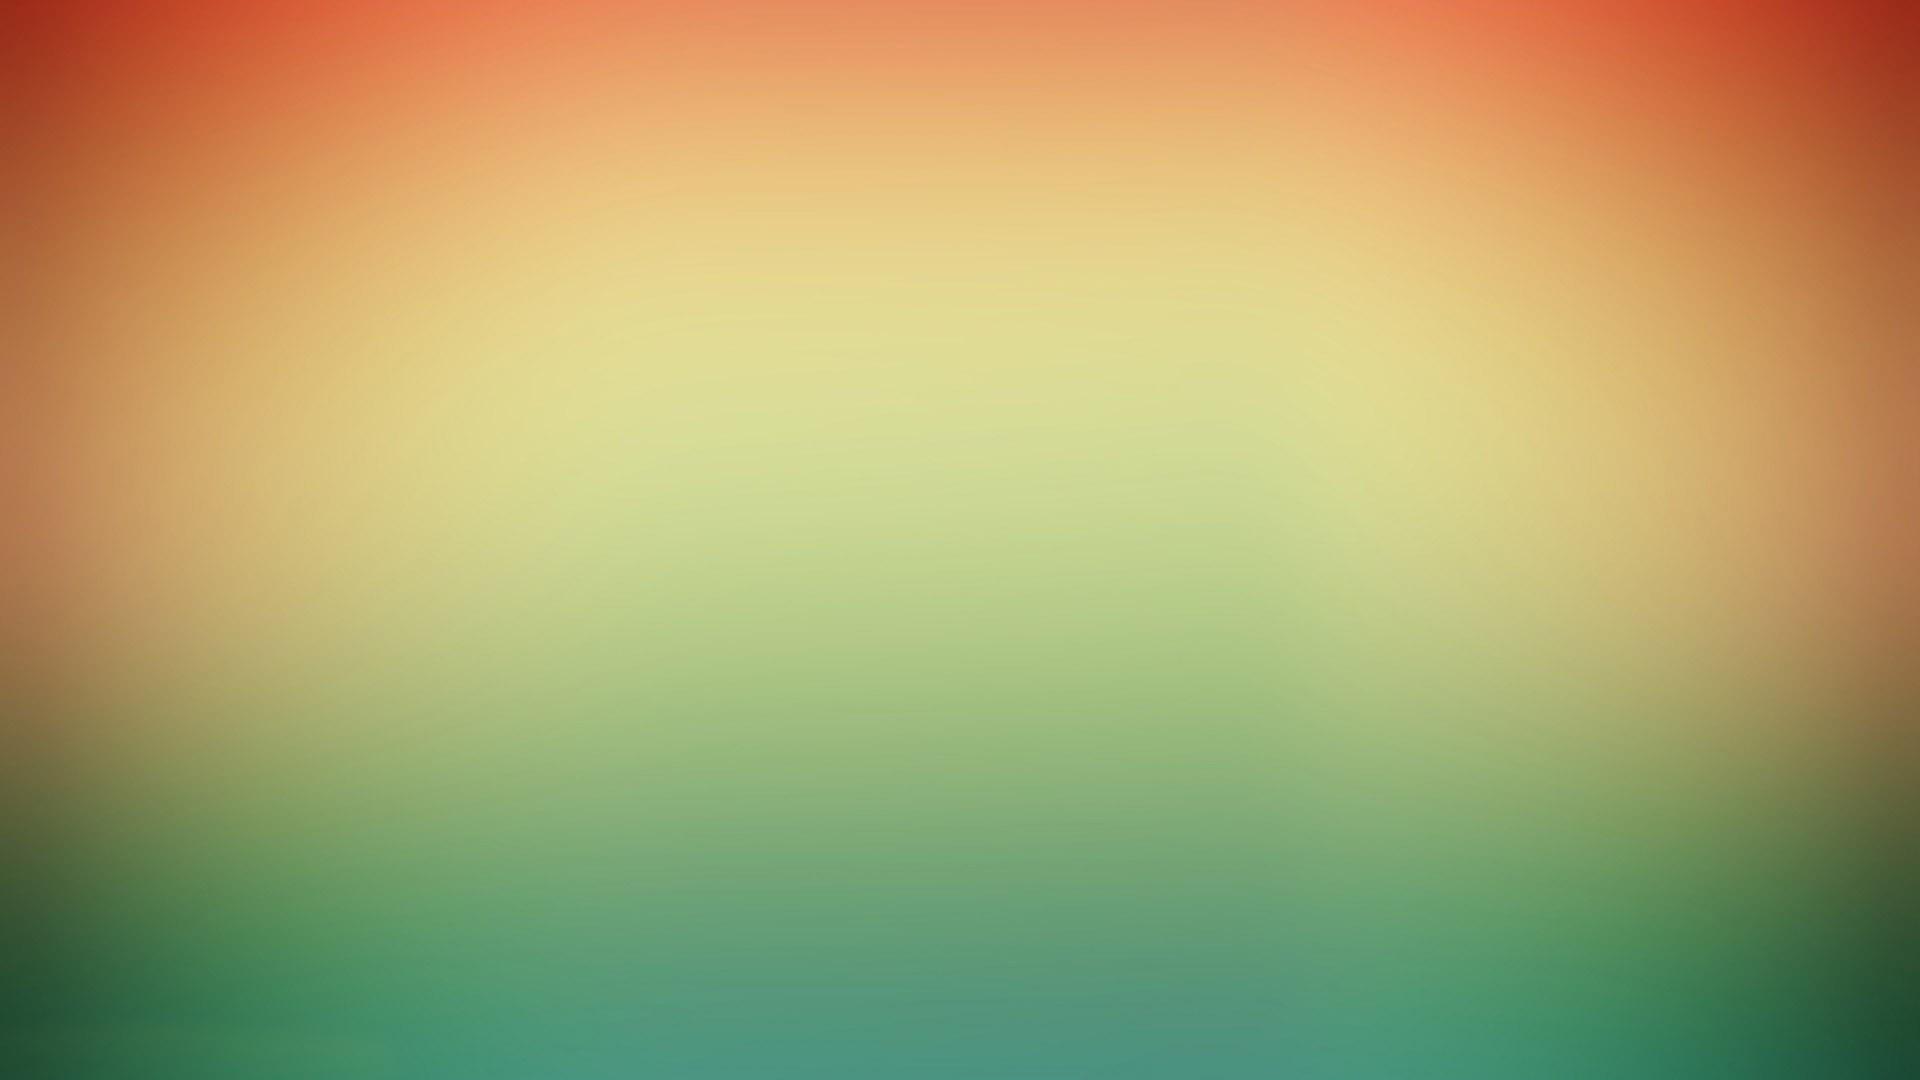 orange color wallpaper iphone